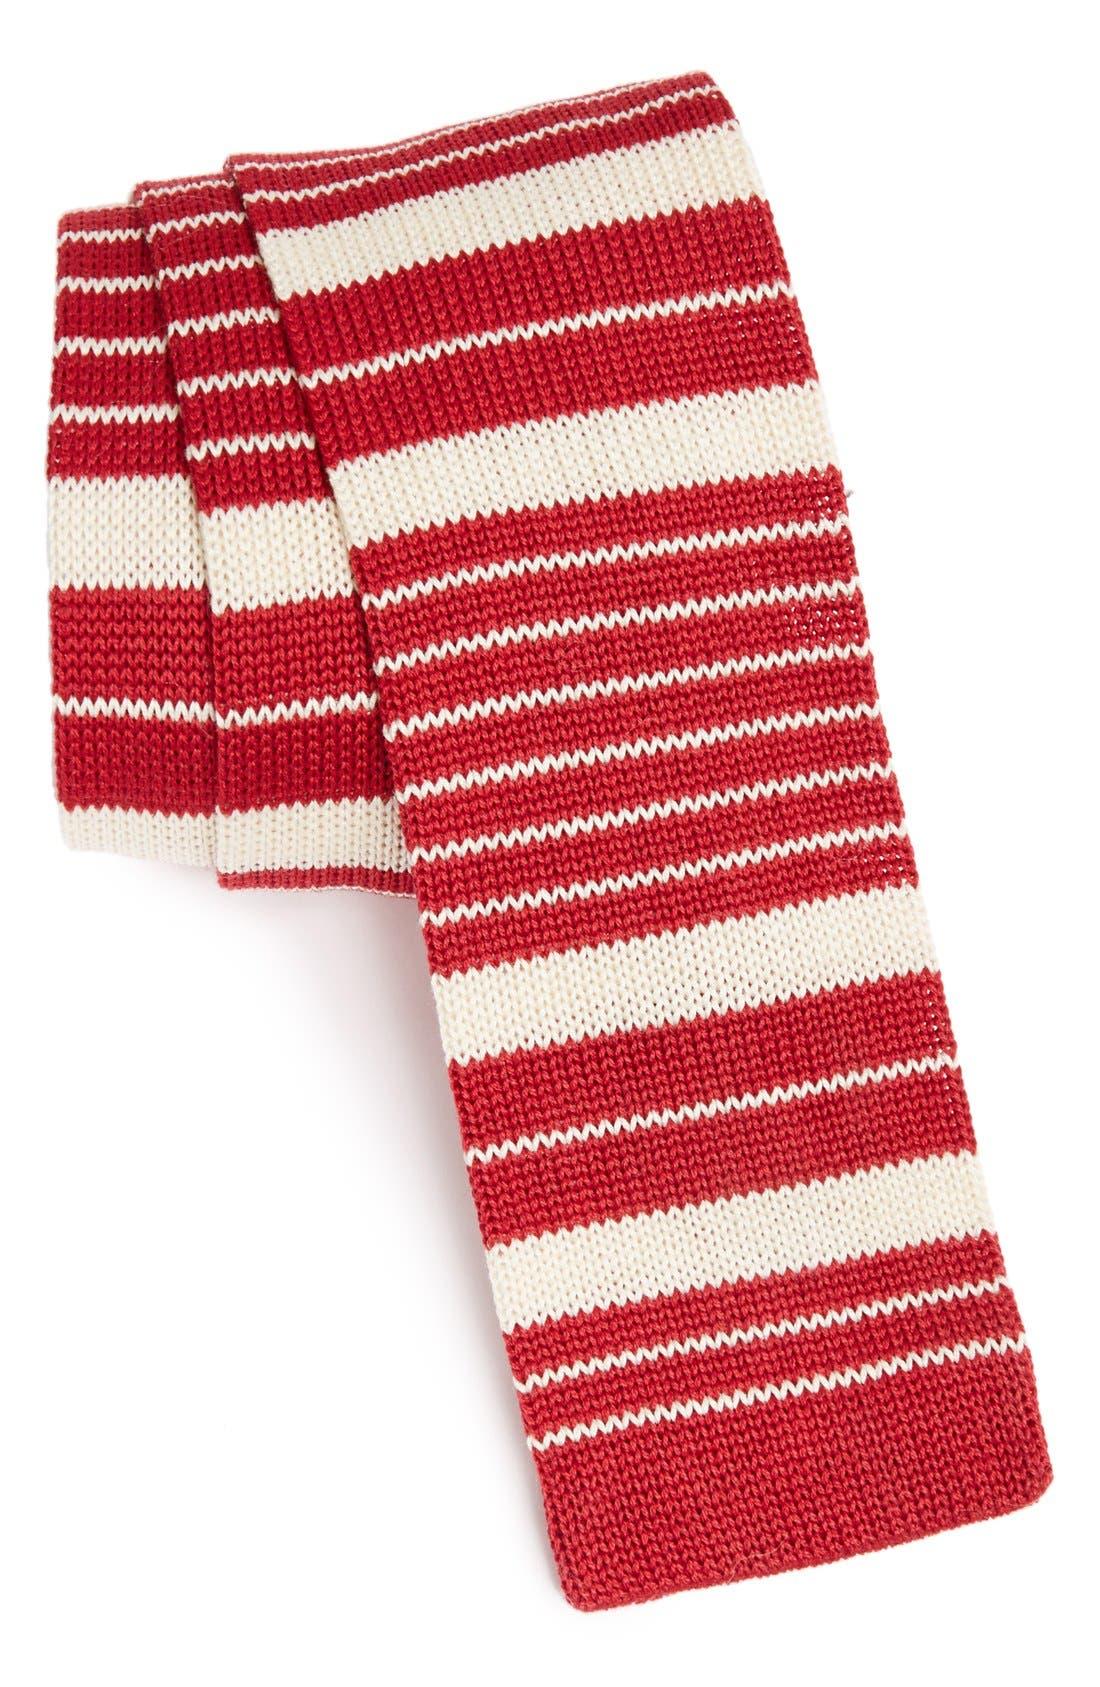 Main Image - IVY PREPSTER Stripe Knit Cotton Tie